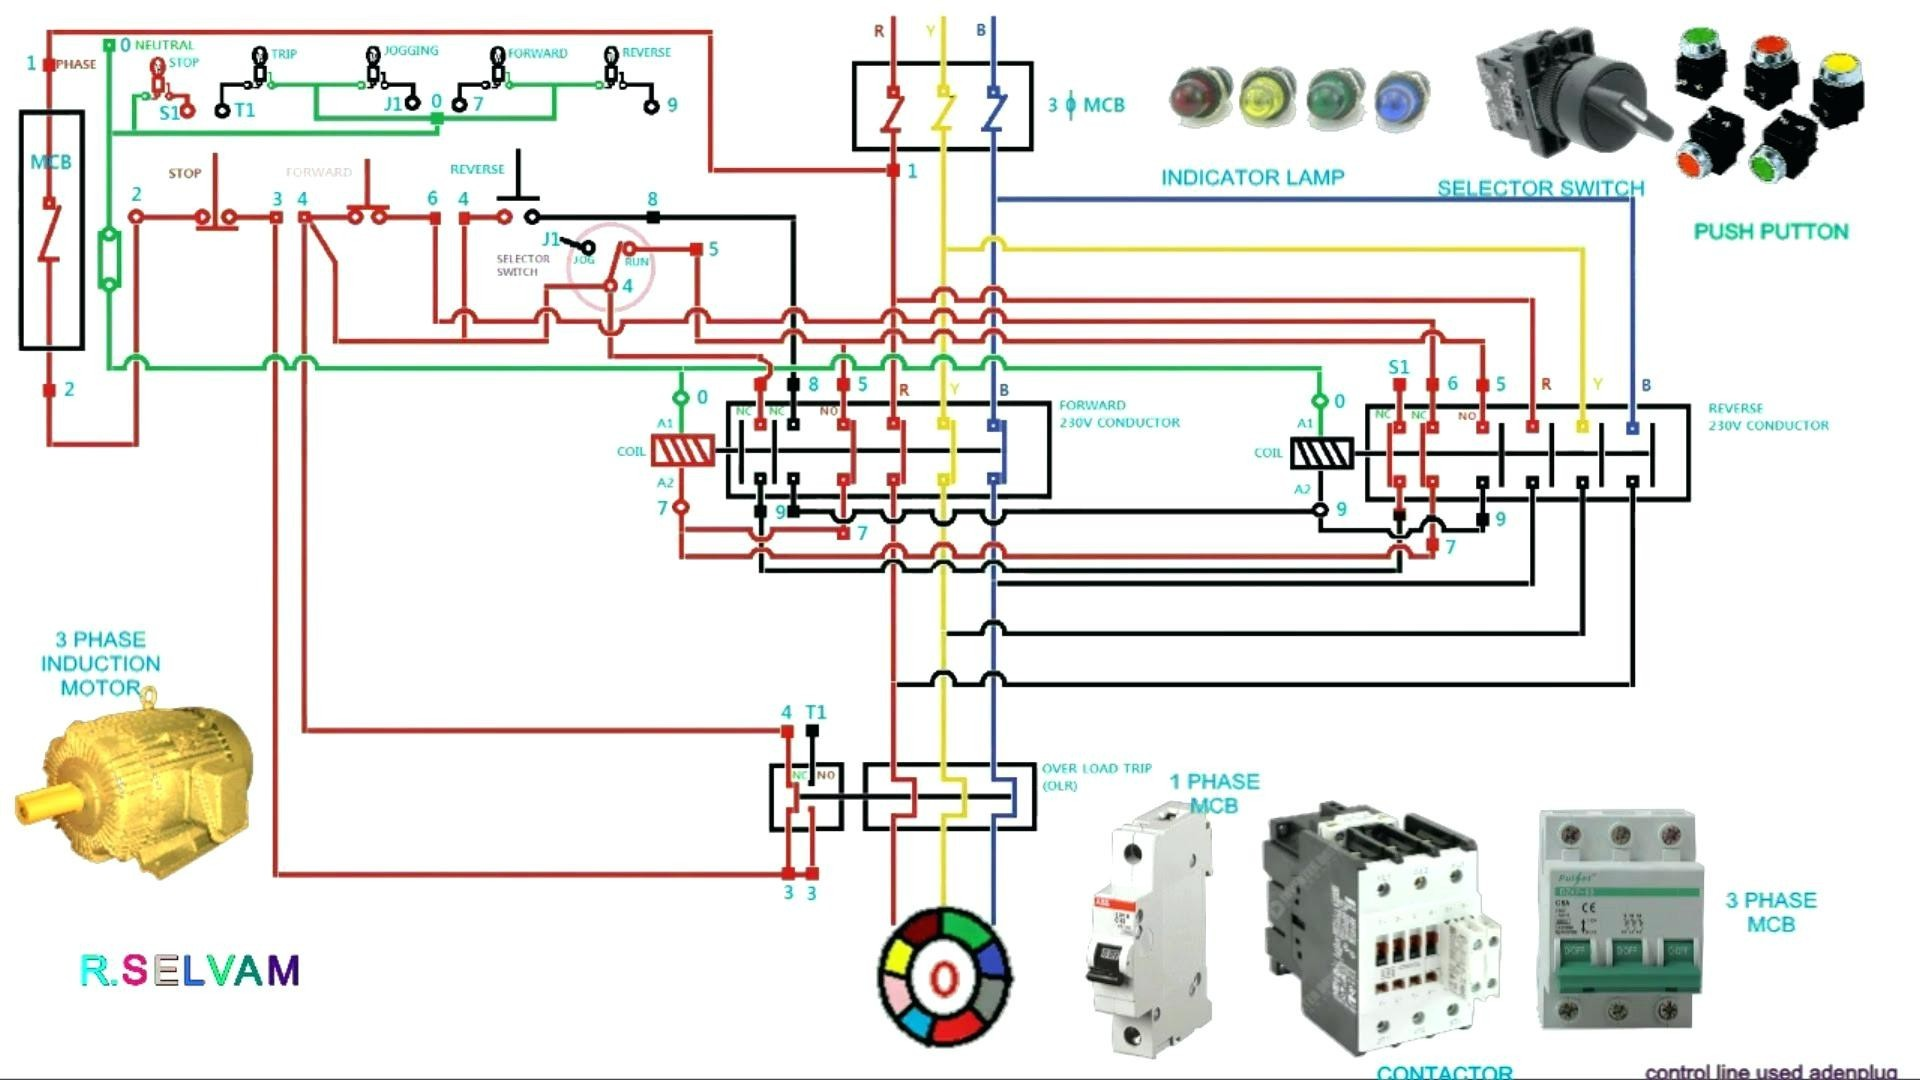 480 volt contactor wiring diagram 480v 3 phase motor wiring diagram elegant wiring diagram 480 volt generator wiring diagram